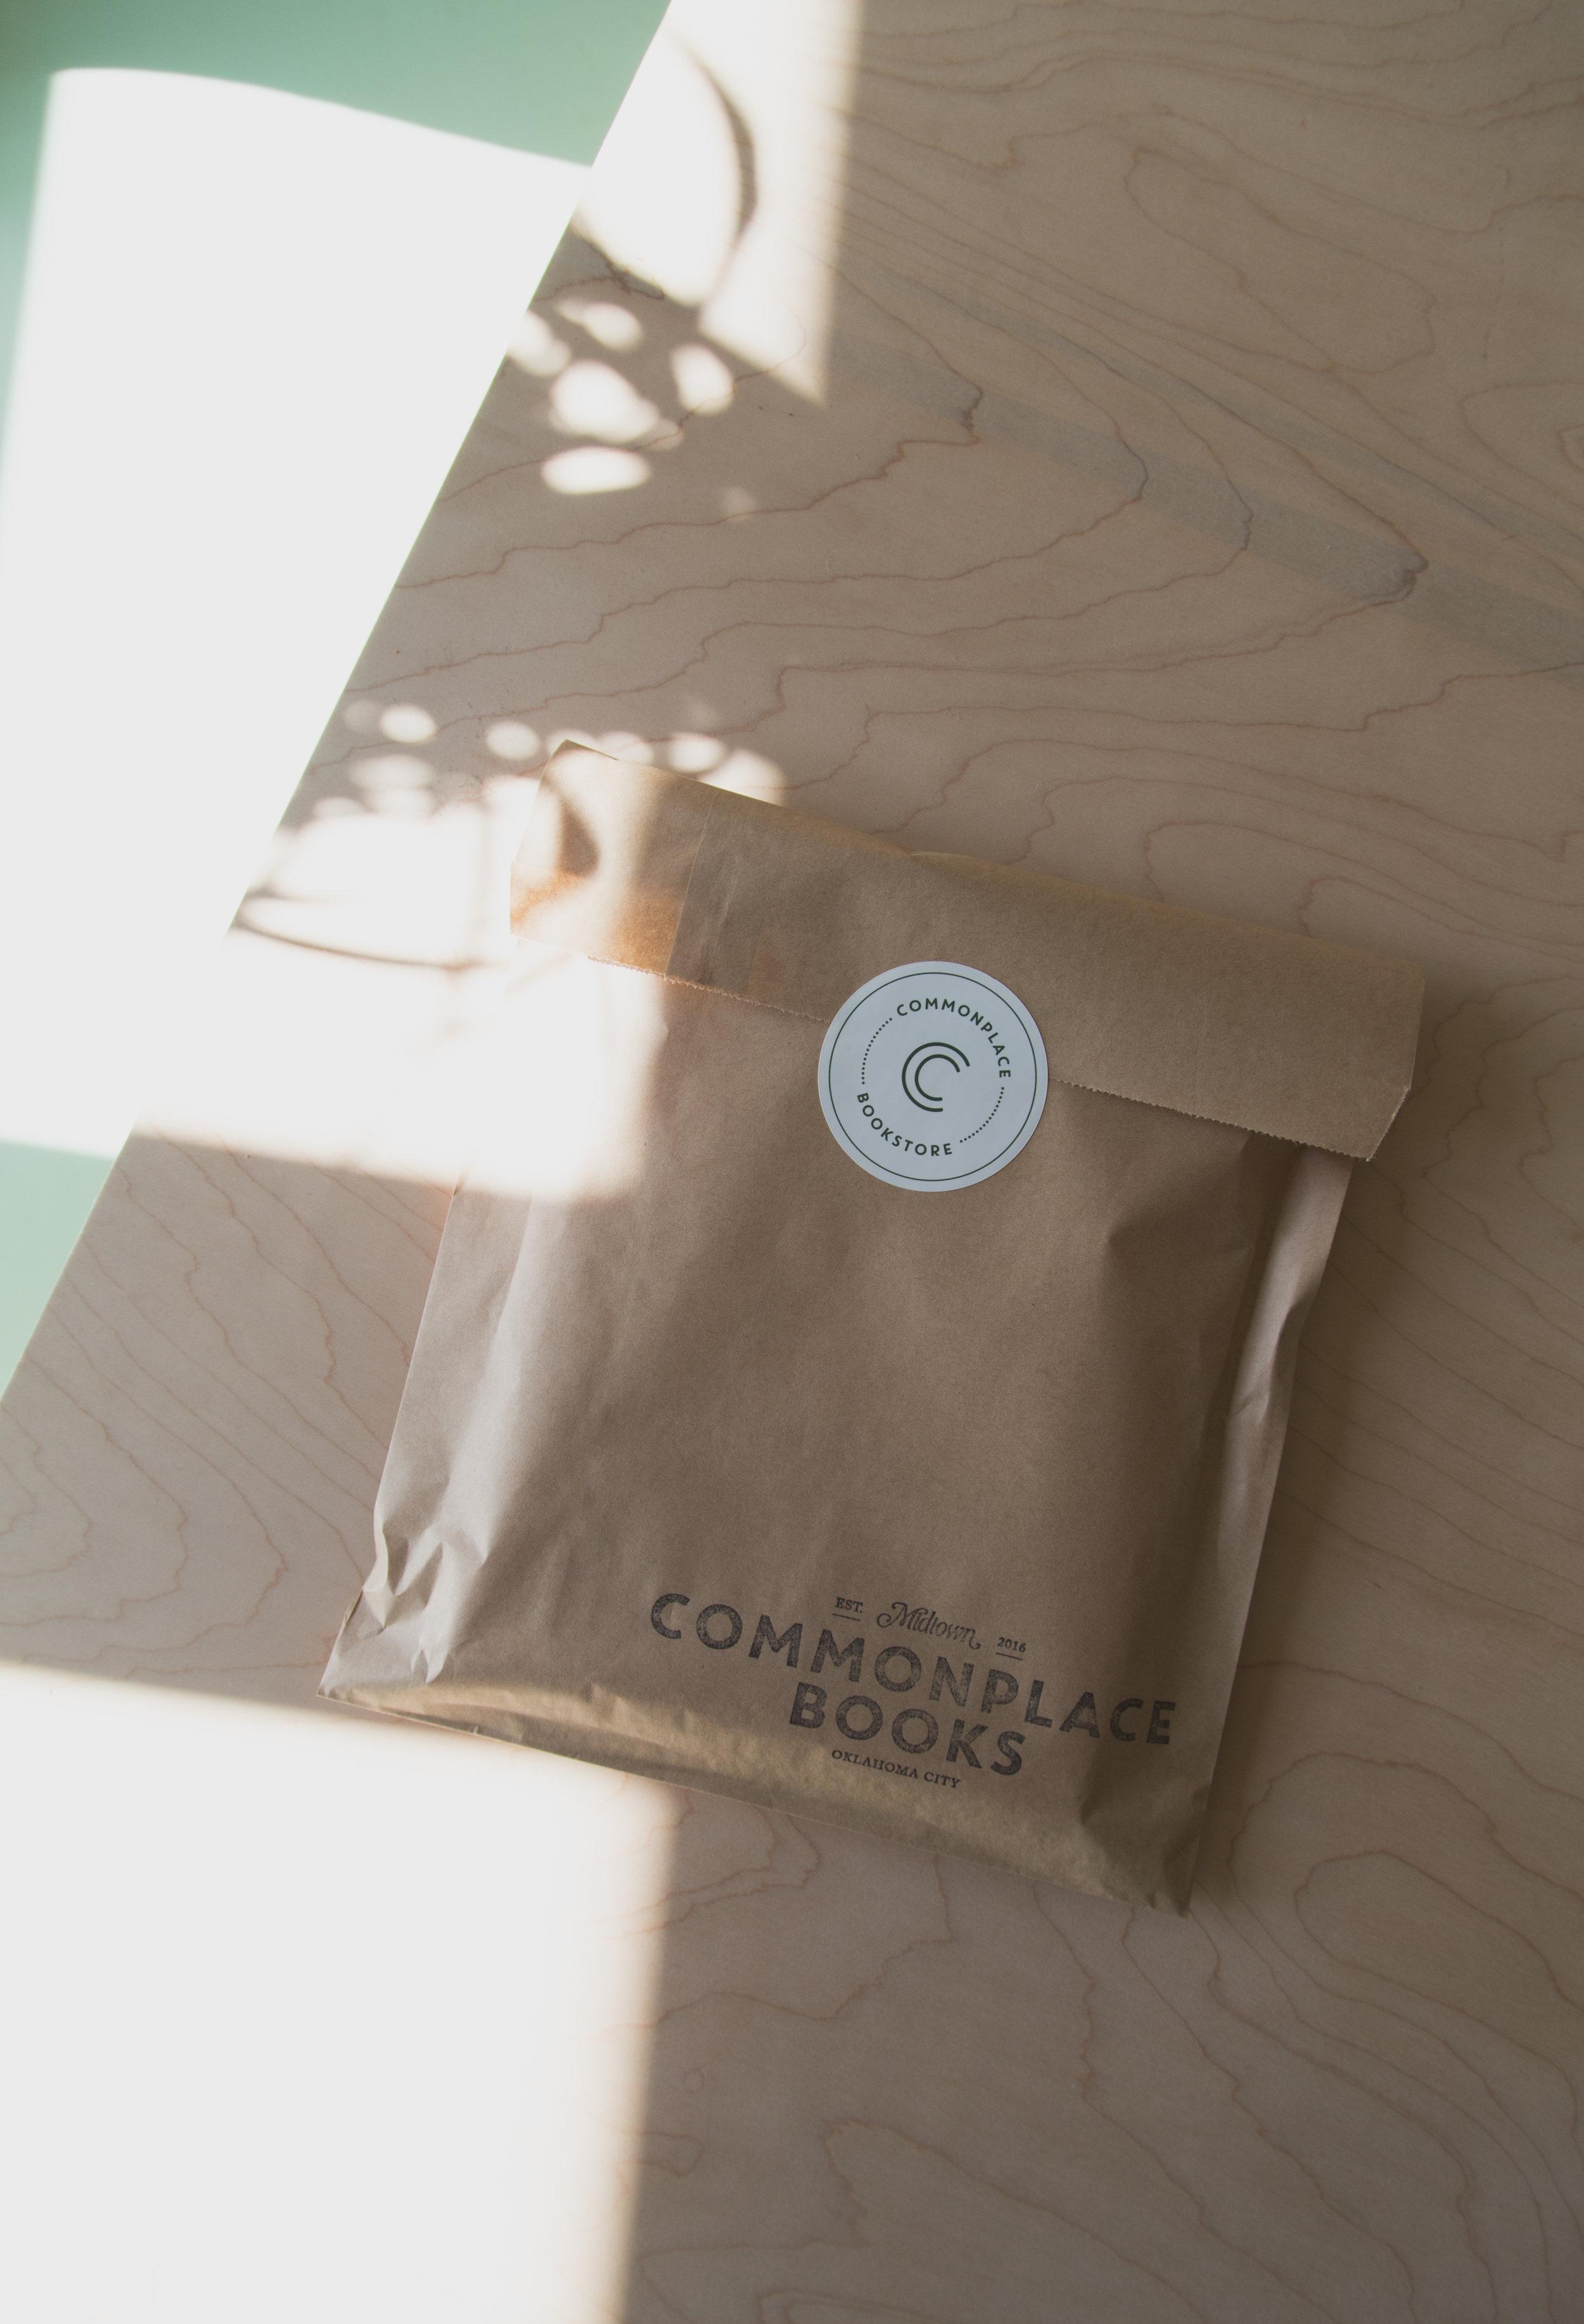 CPB_CommonplaceBooks-120.jpg